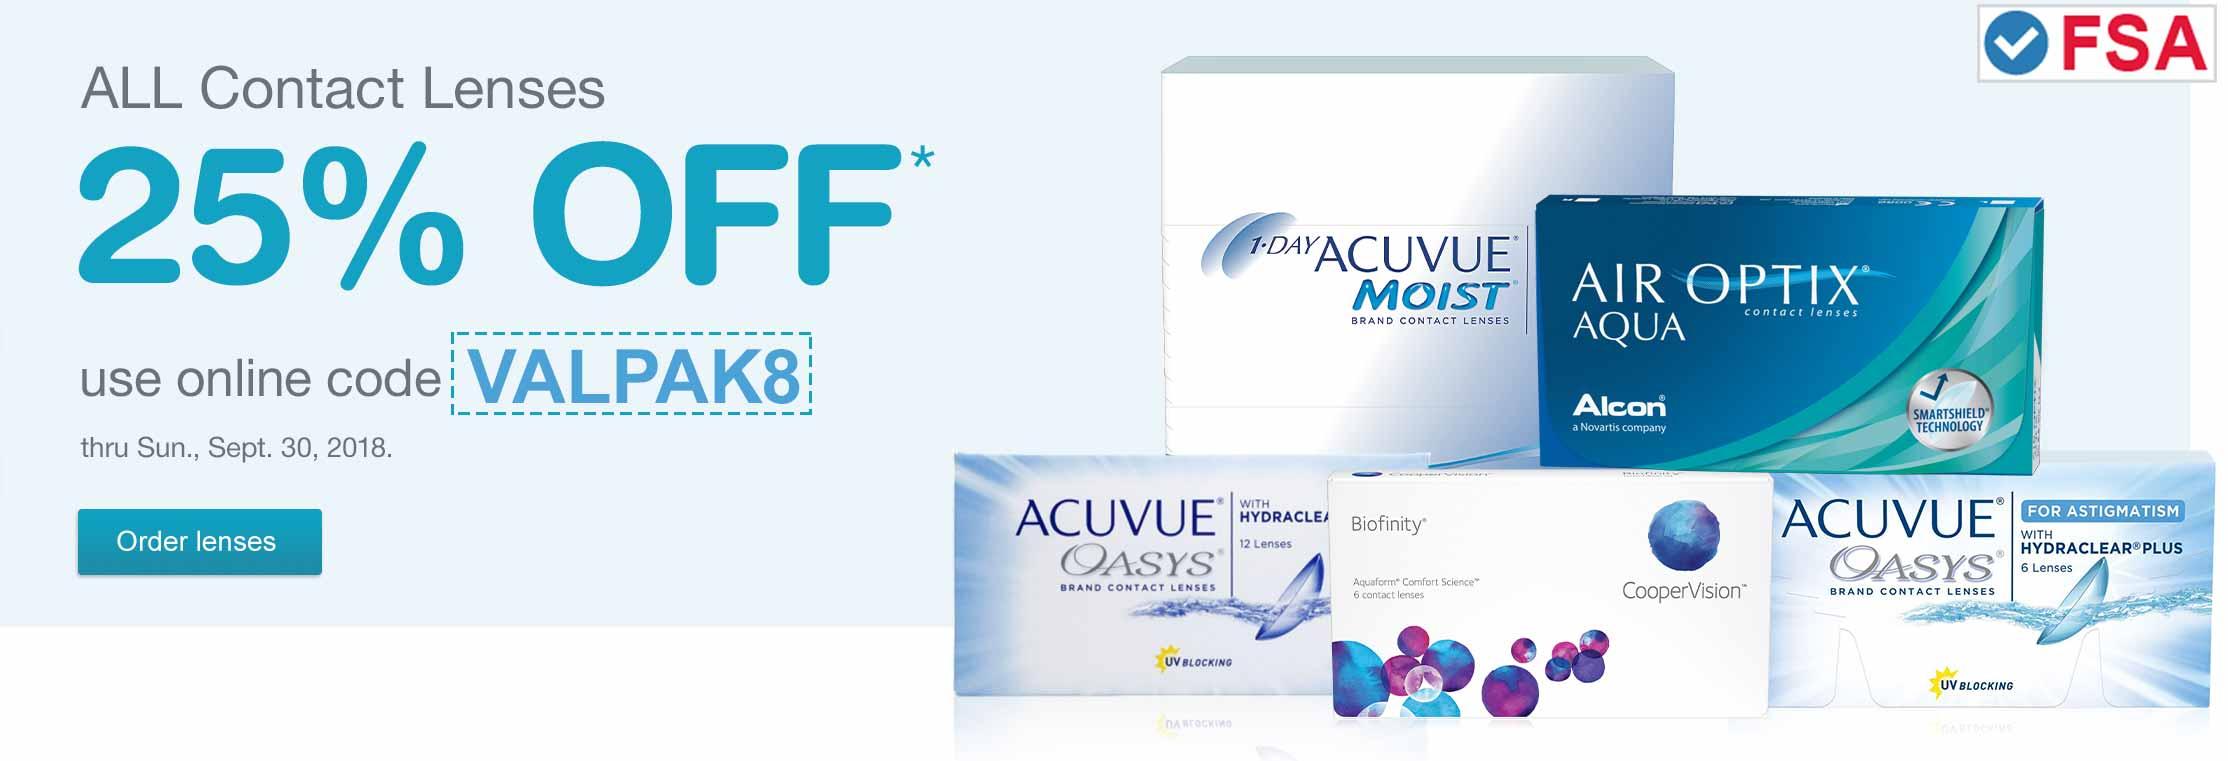 Walgreens Contact Lens Valpak8 Sale | Order Acuvue, Air Optix ...